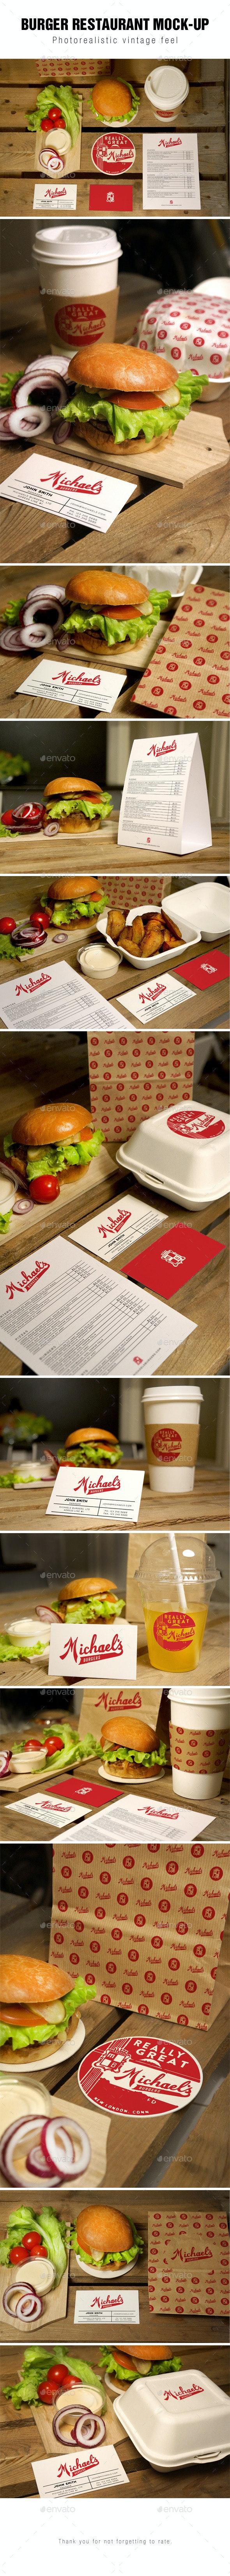 Burger Restaurant Mockup - Product Mock-Ups Graphics